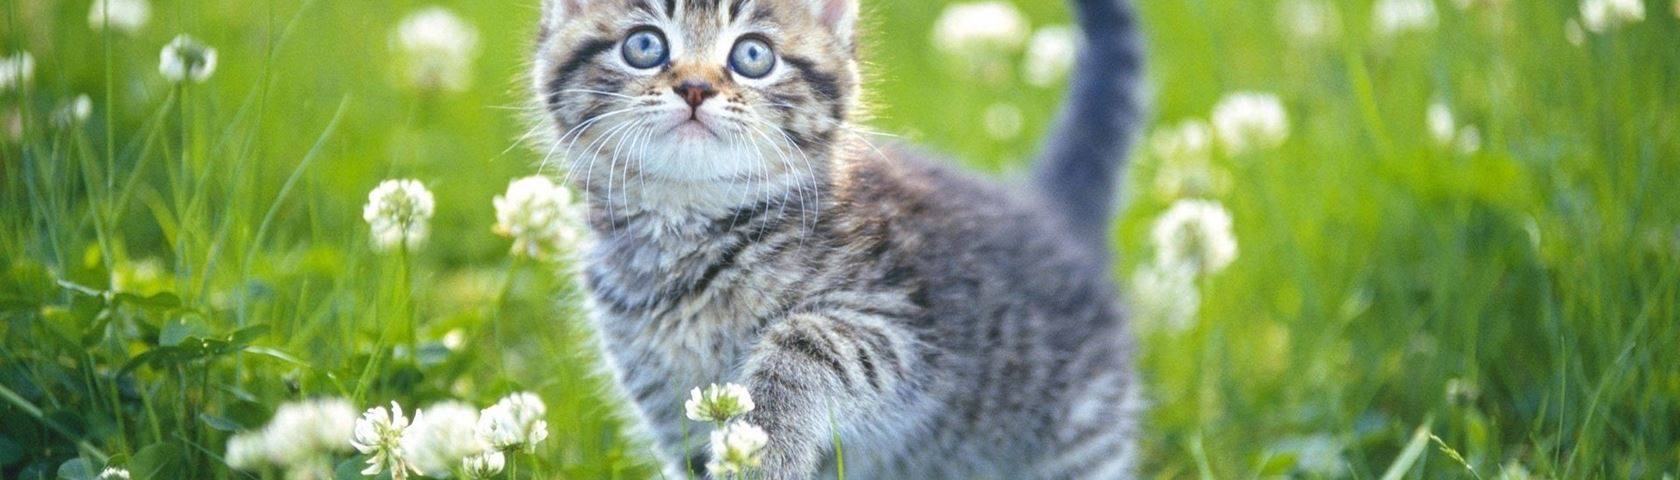 Adventures in Kittyland